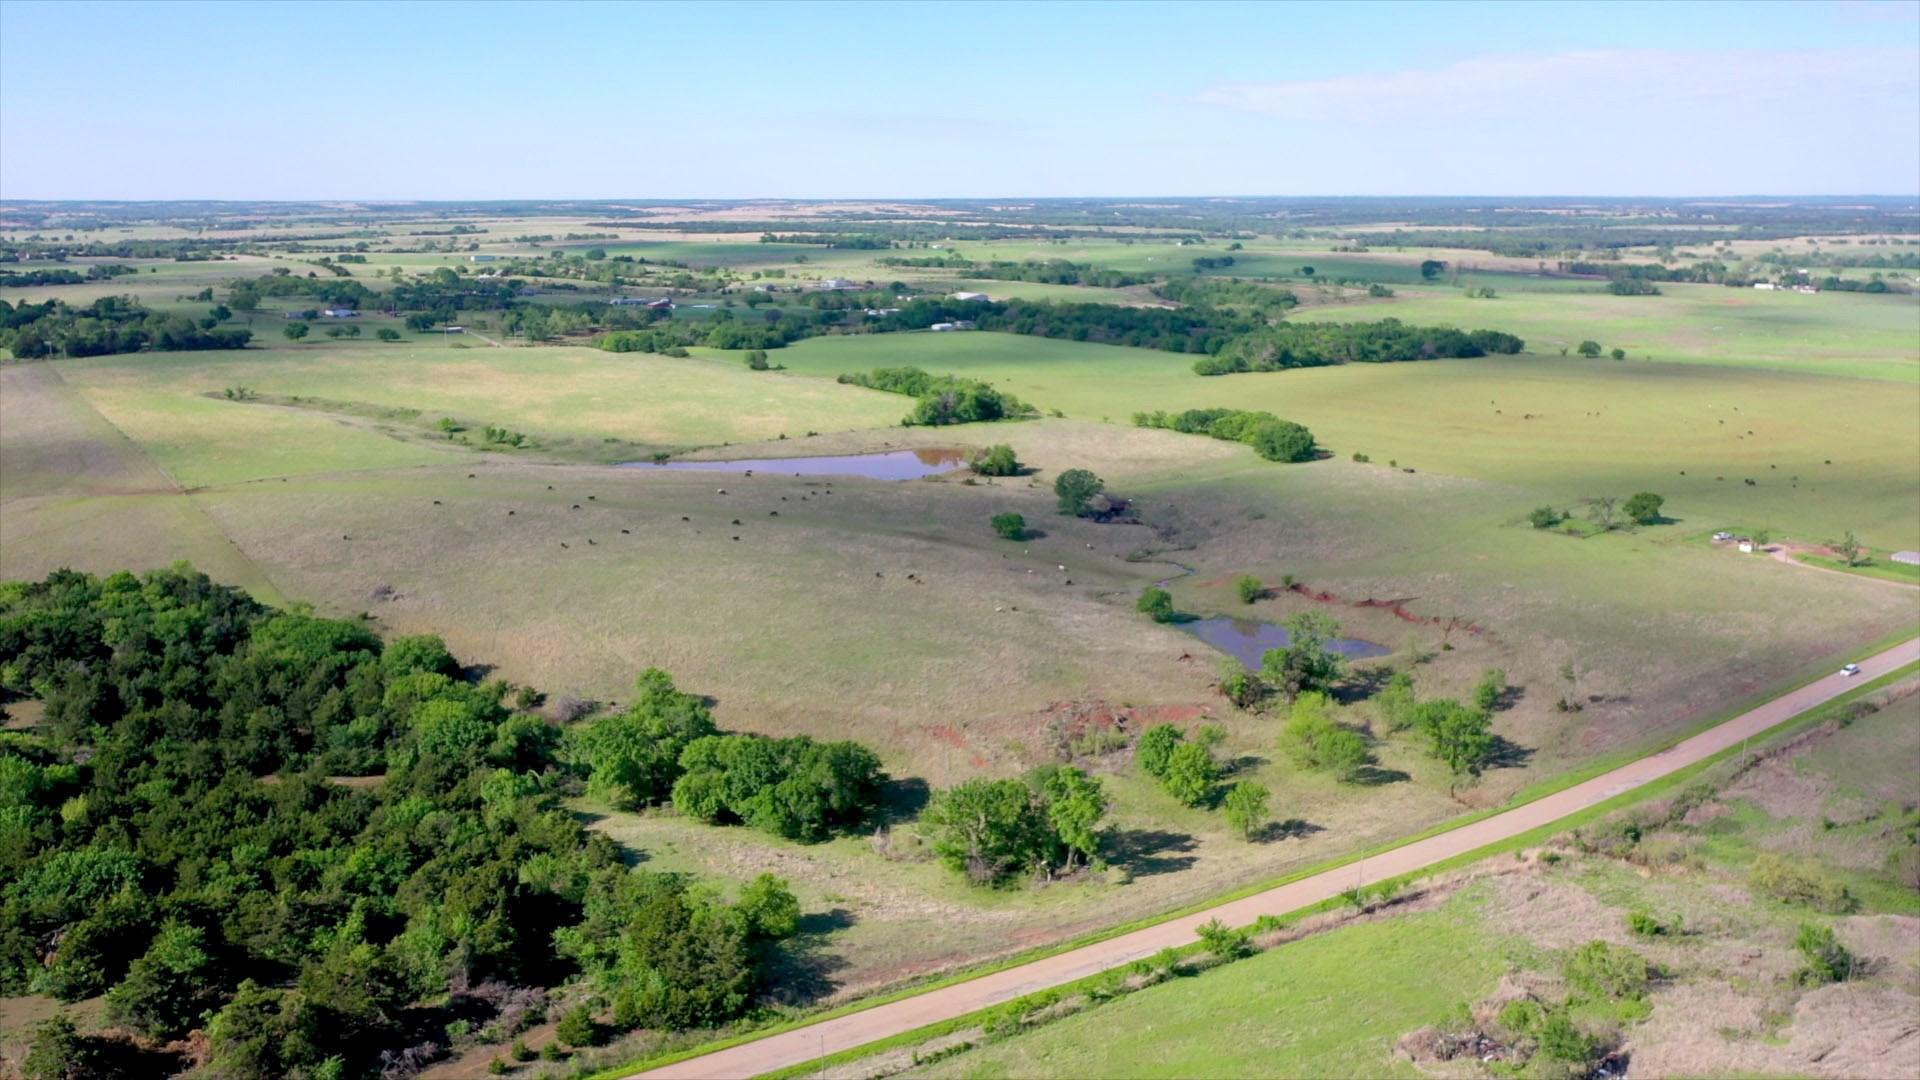 No Reserve Land Auction, Perkins OK, Jun 15 @ 6:30 p.m. Tr 6